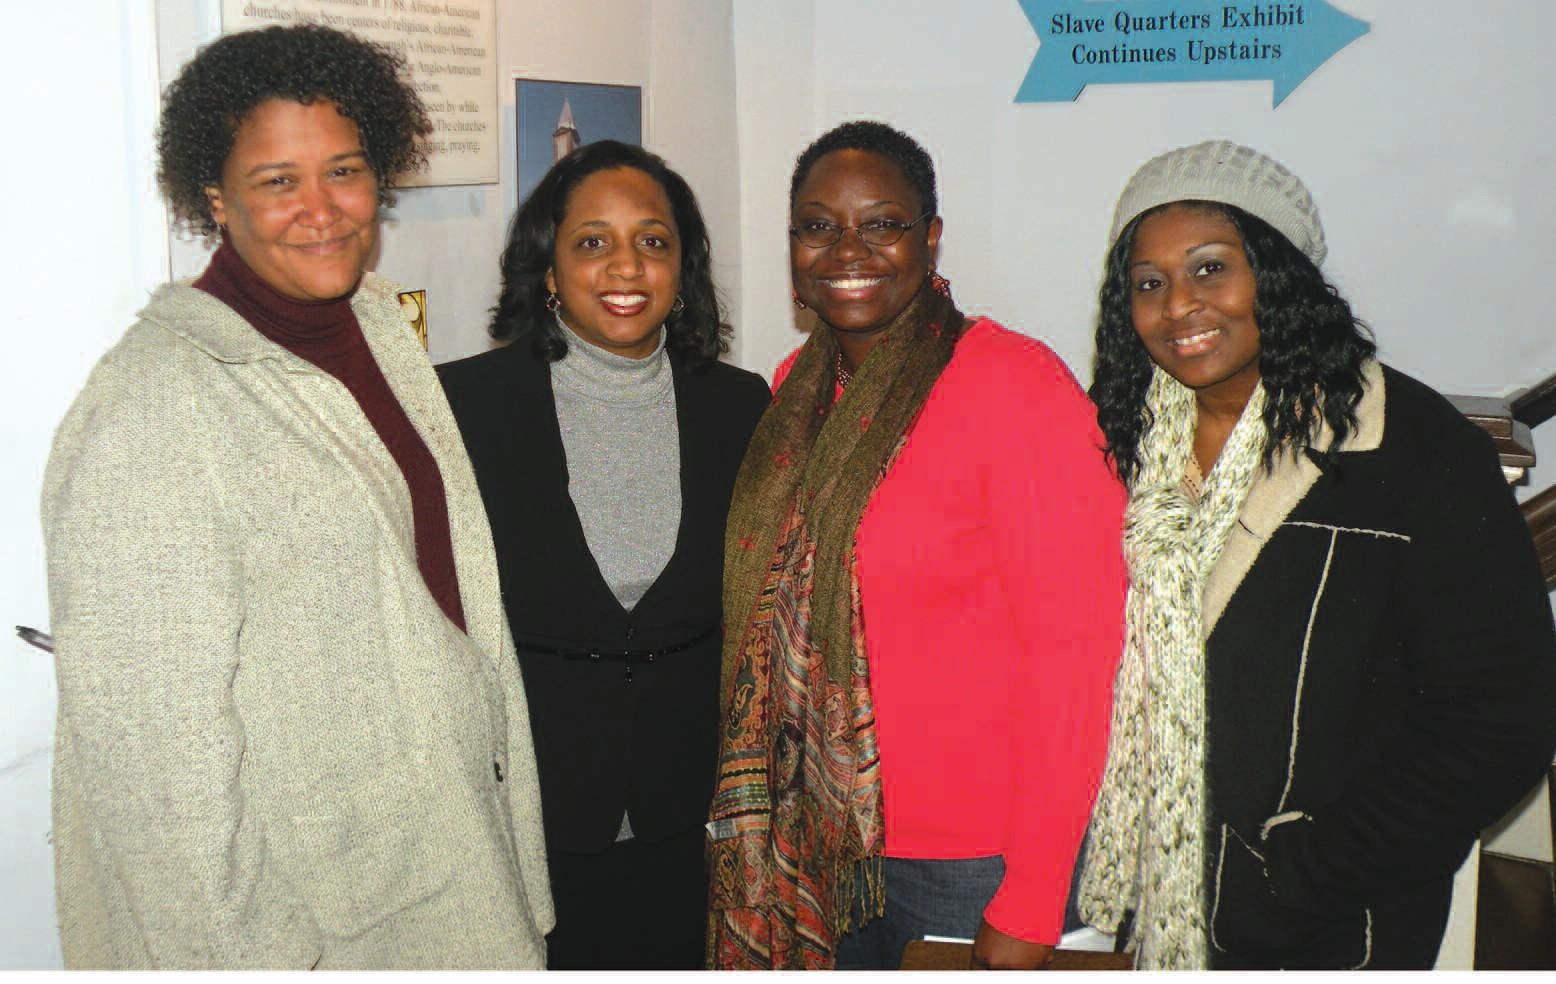 Dr. Leslie Harris, Emory University, Dr. Daina Ramey Berry, University of Texas, DaVena Sanders Jordan, AWOL, Lakesha Green, AWOL